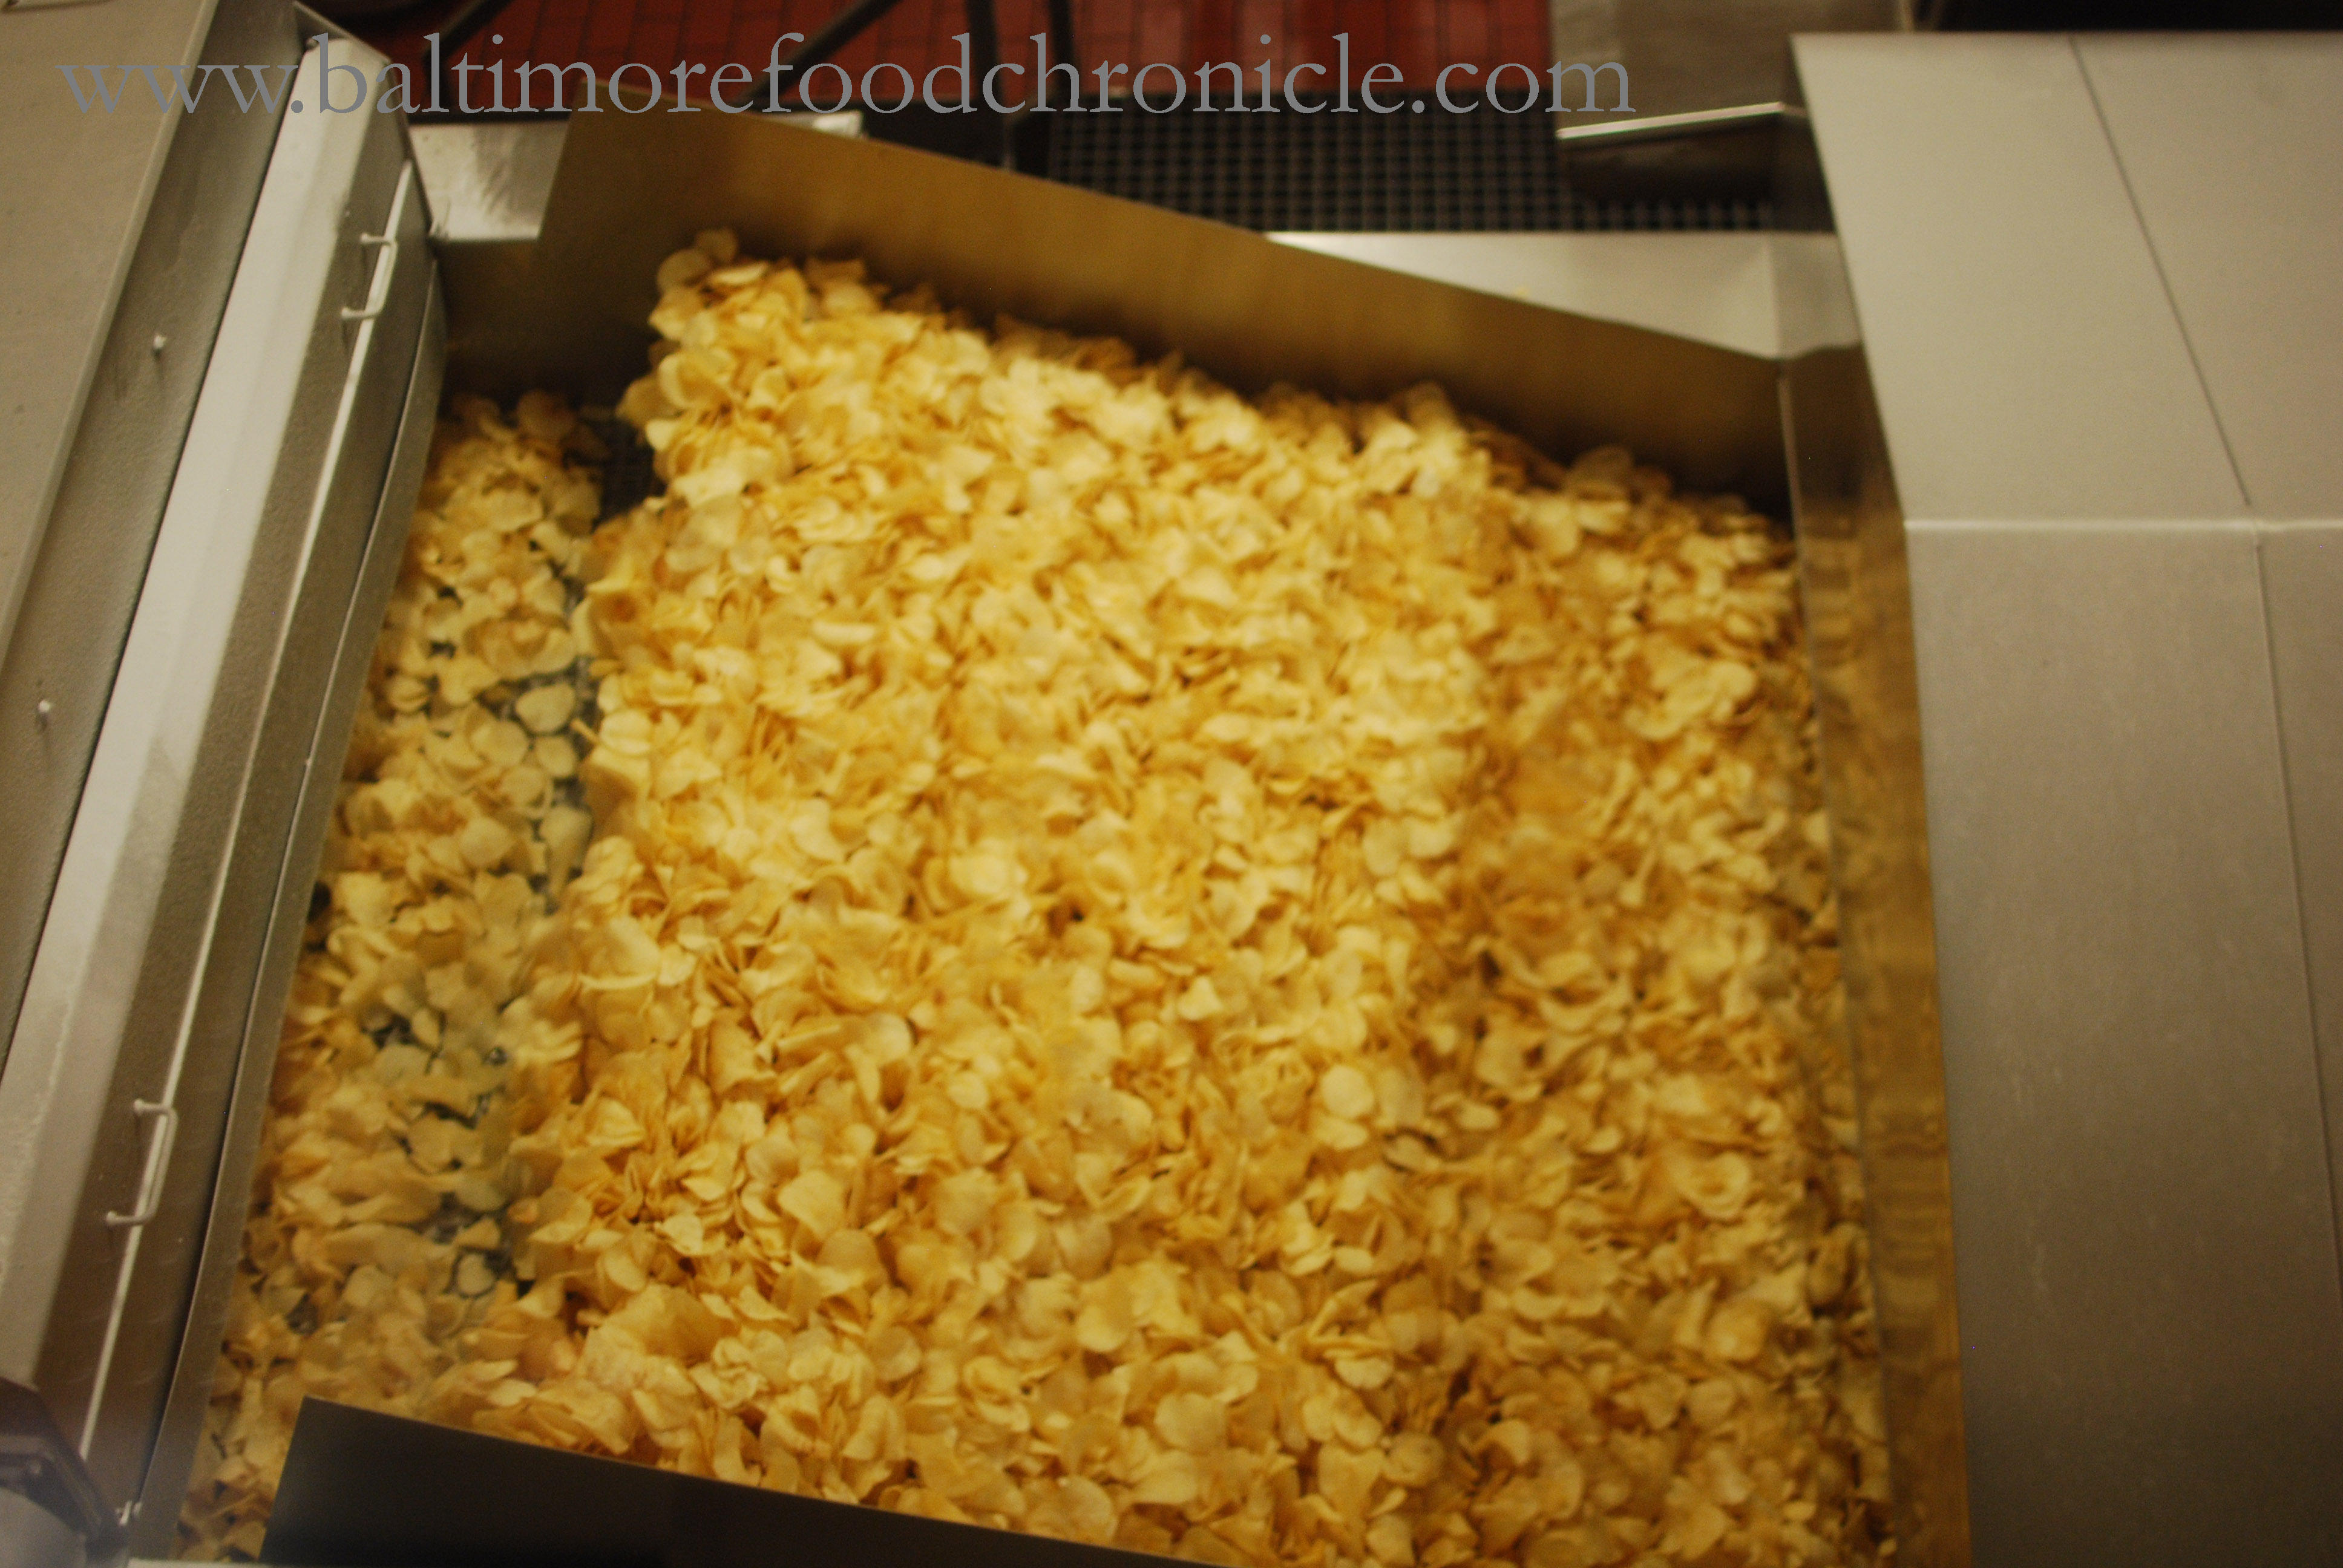 UTZ Potato Chips – Baltimore Food Chronicle